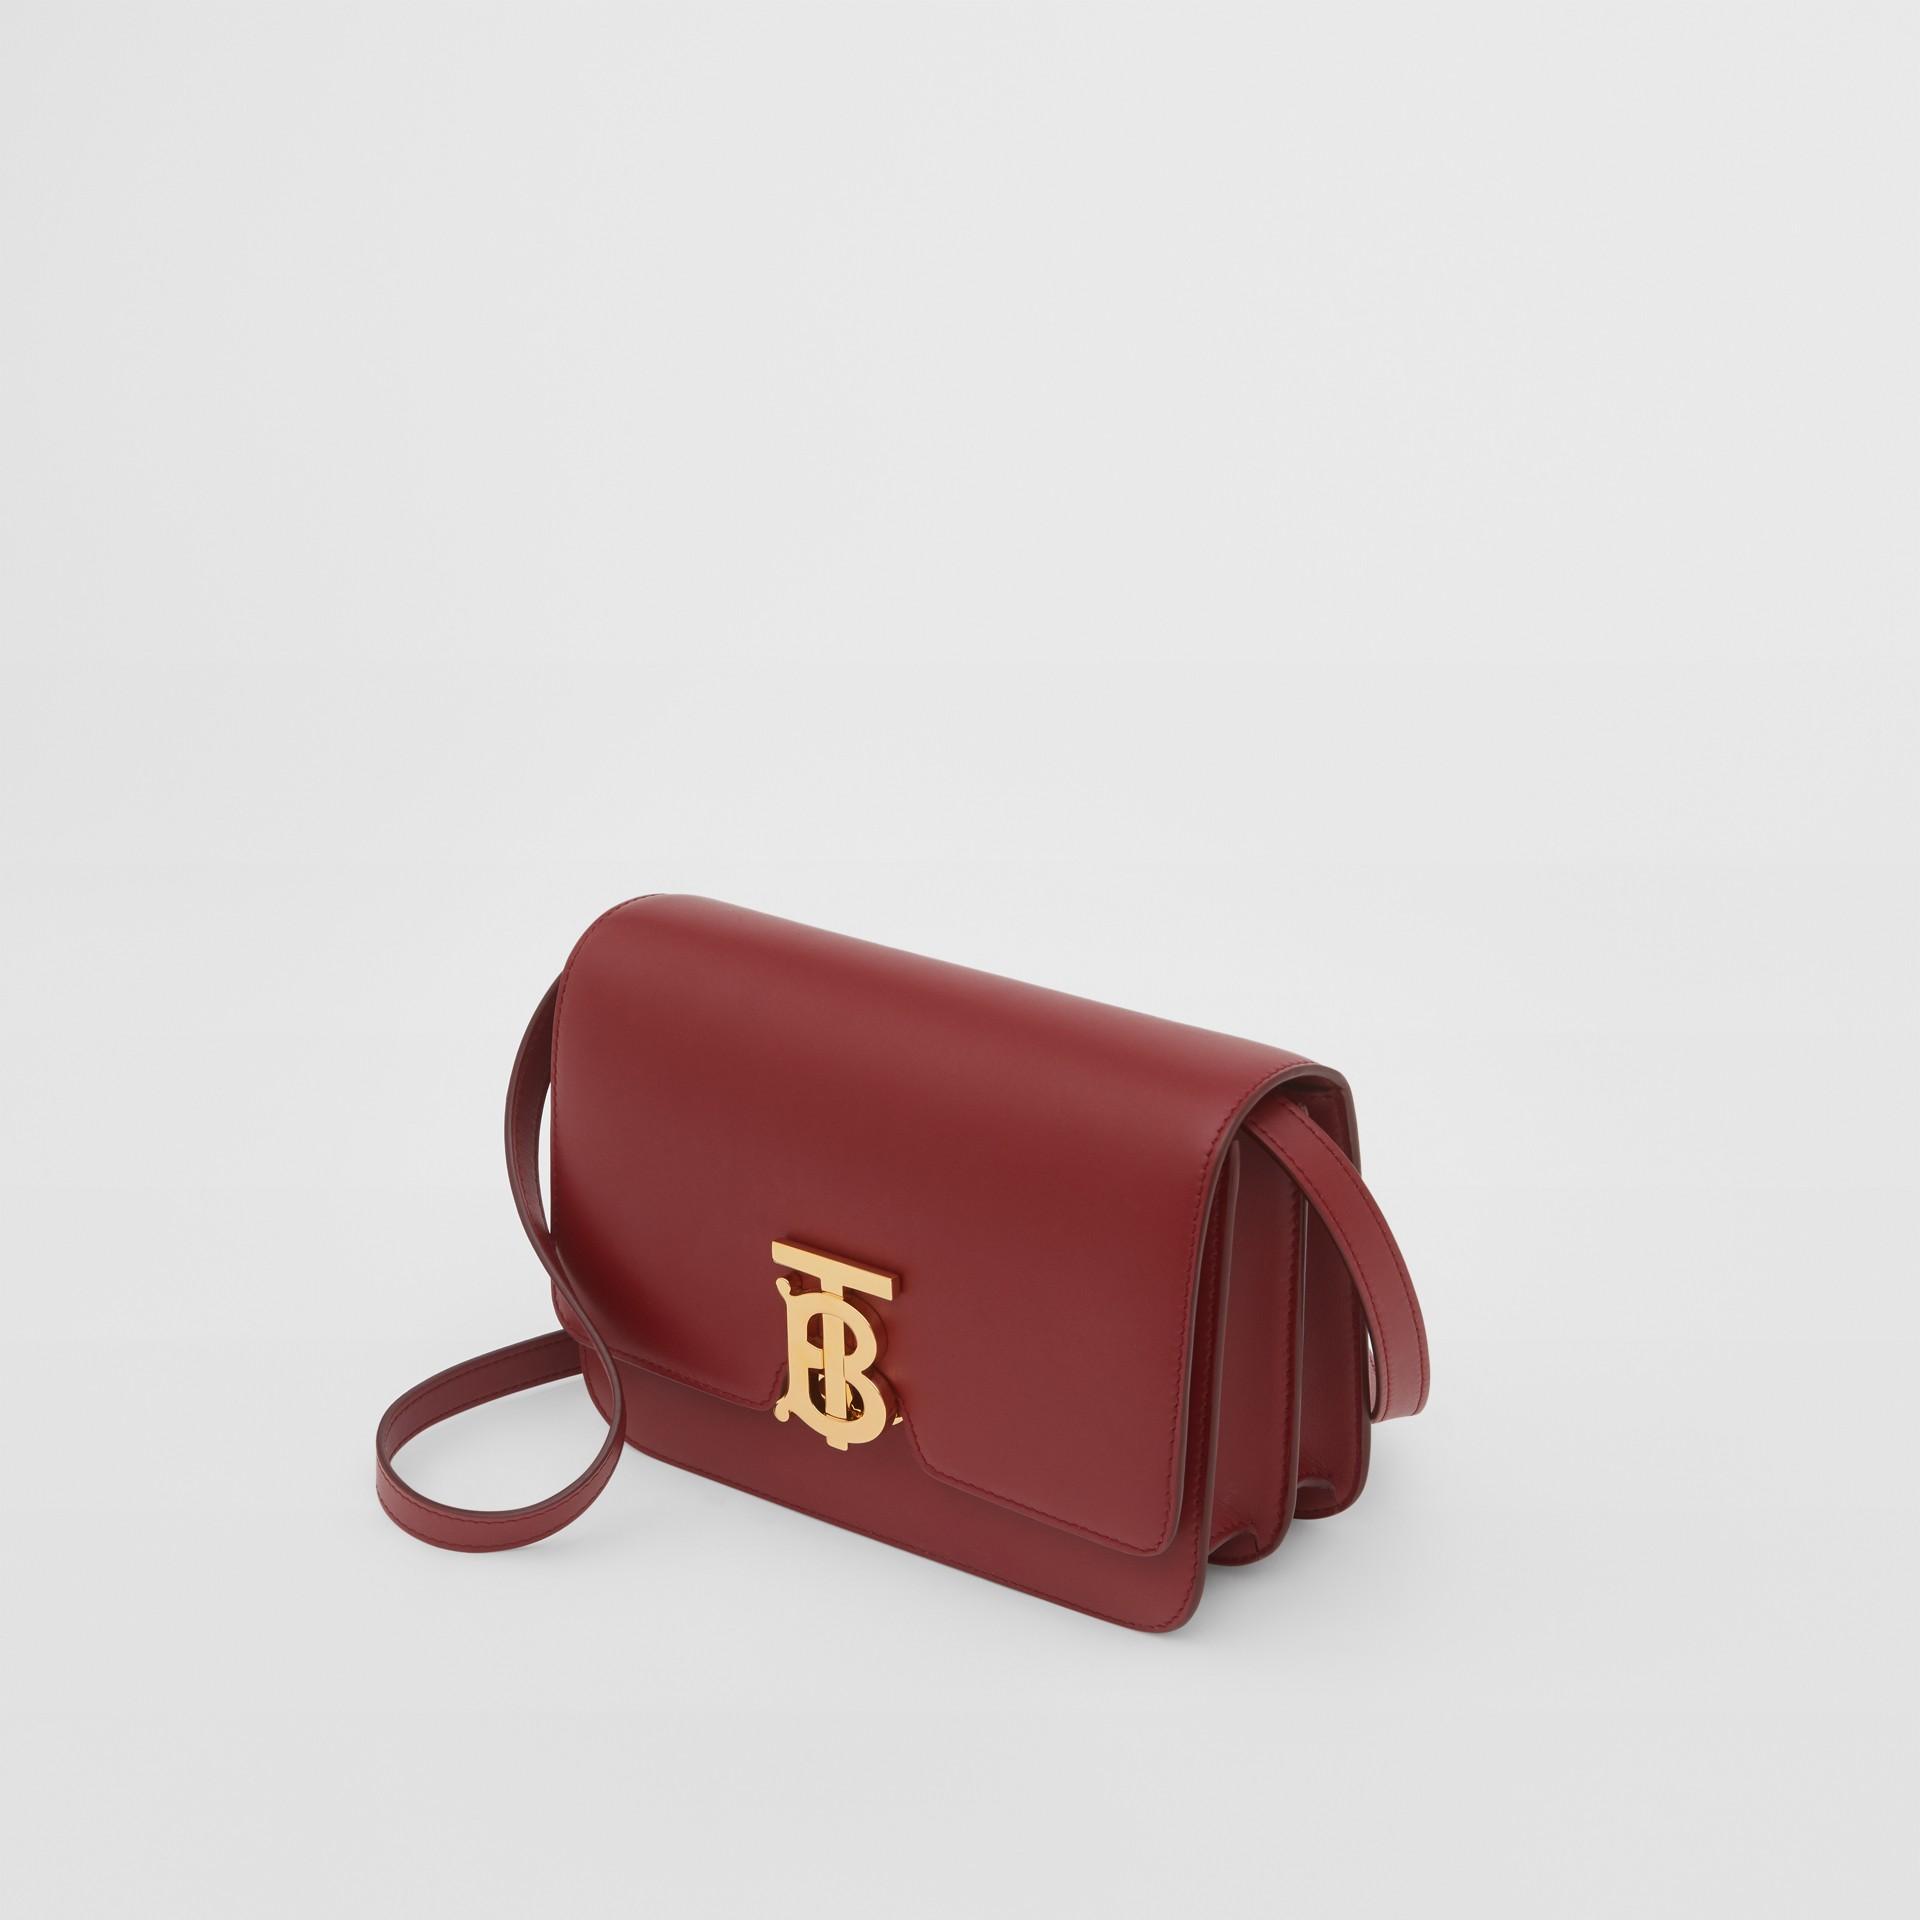 Small Leather TB Bag in Dark Crimson - Women   Burberry - gallery image 3